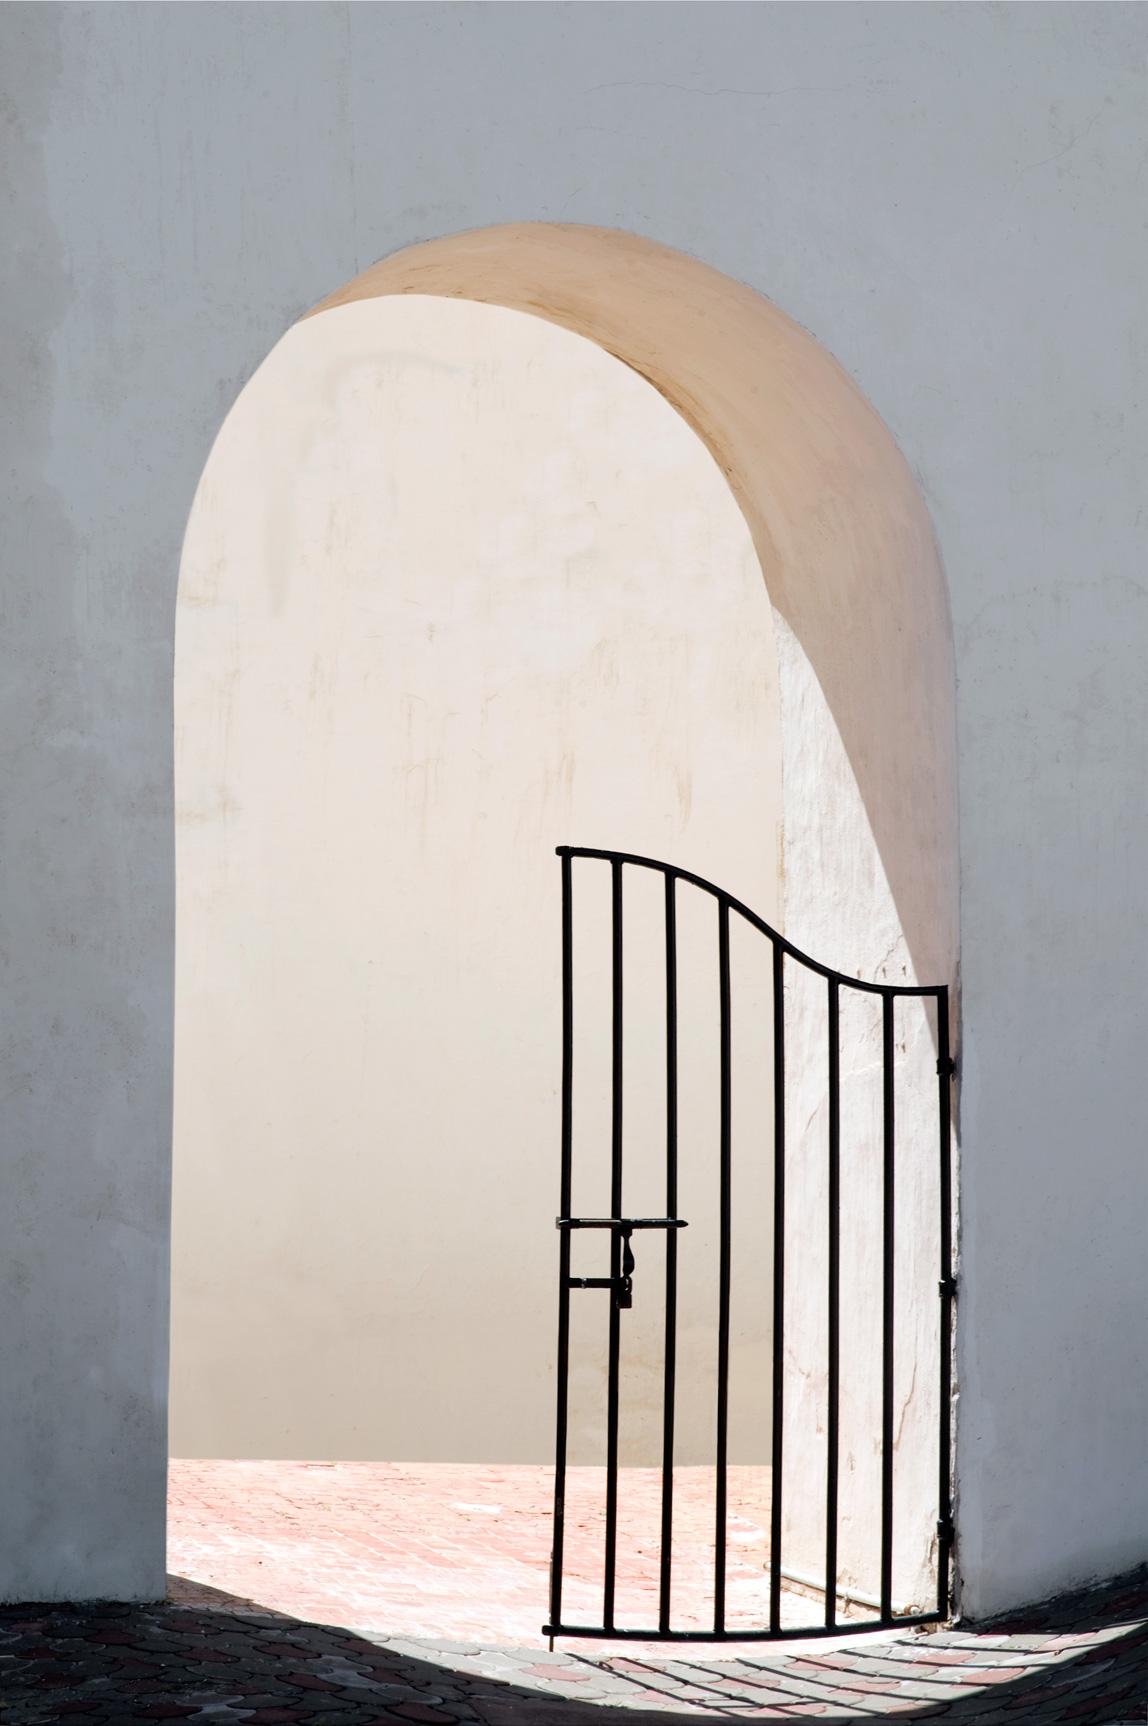 Safi Gate, Morocco, Africa (010004)